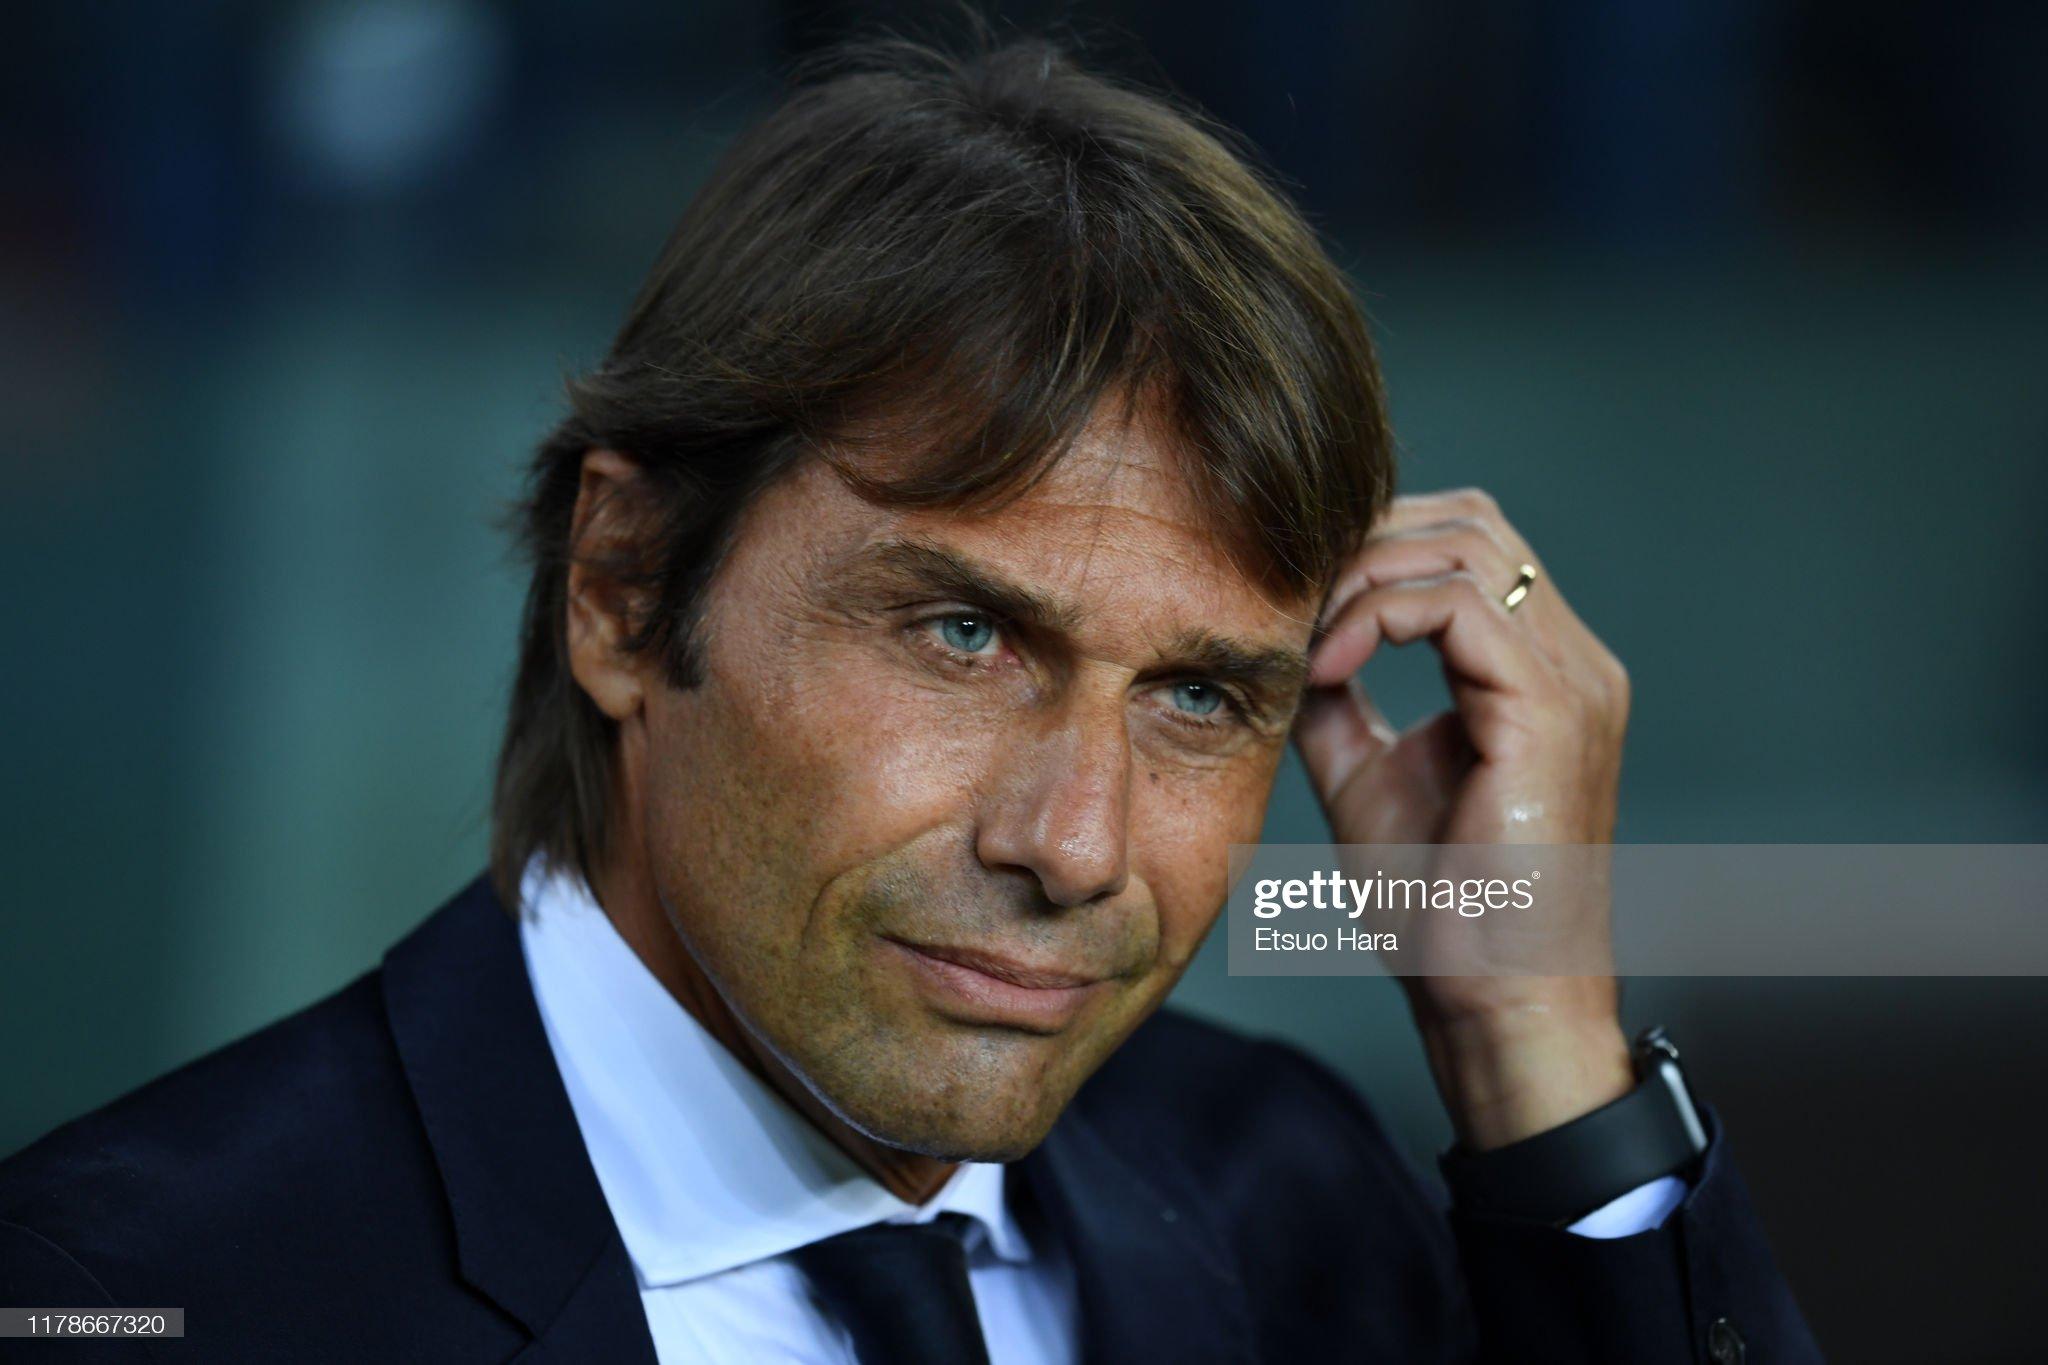 صور مباراة : برشلونة - إنتر 2-1 ( 02-10-2019 )  Inter-head-coach-antonio-conte-is-seen-during-the-uefa-champions-f-picture-id1178667320?s=2048x2048